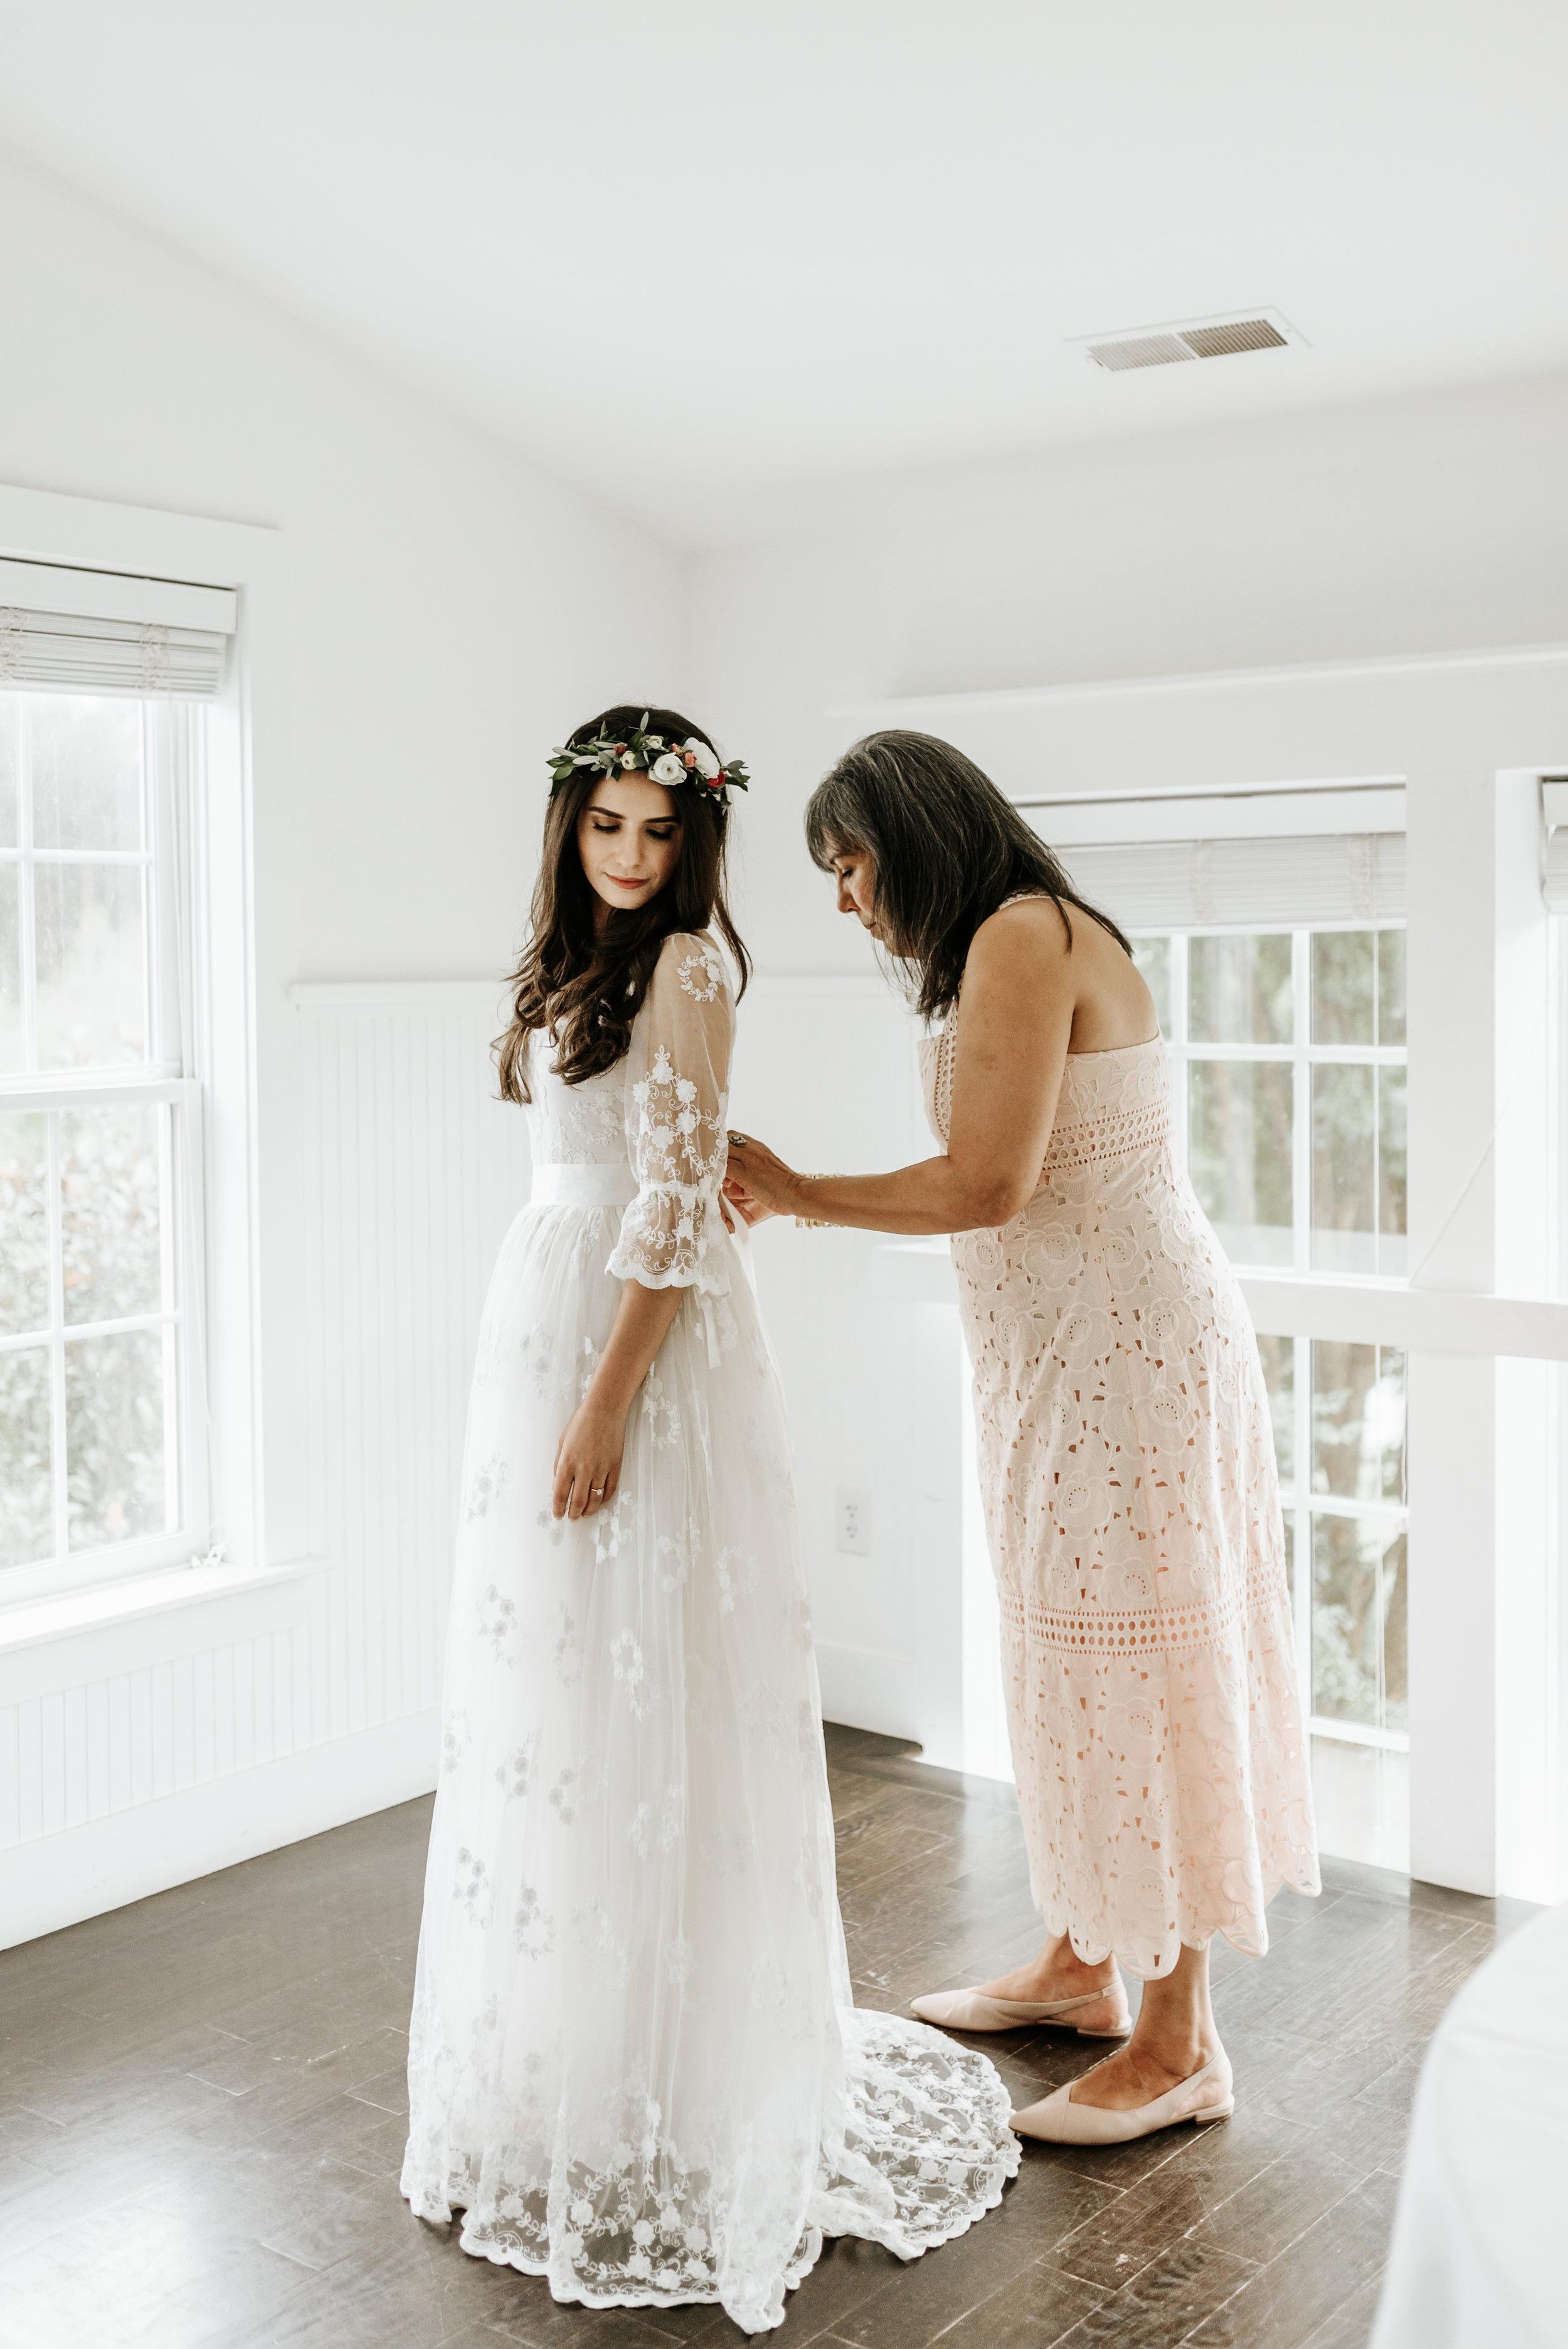 Veritas-Vineyards-and-Winery-Wedding-Photography-Afton-Virginia-Yasmin-Seth-Photography-by-V-9103.jpg